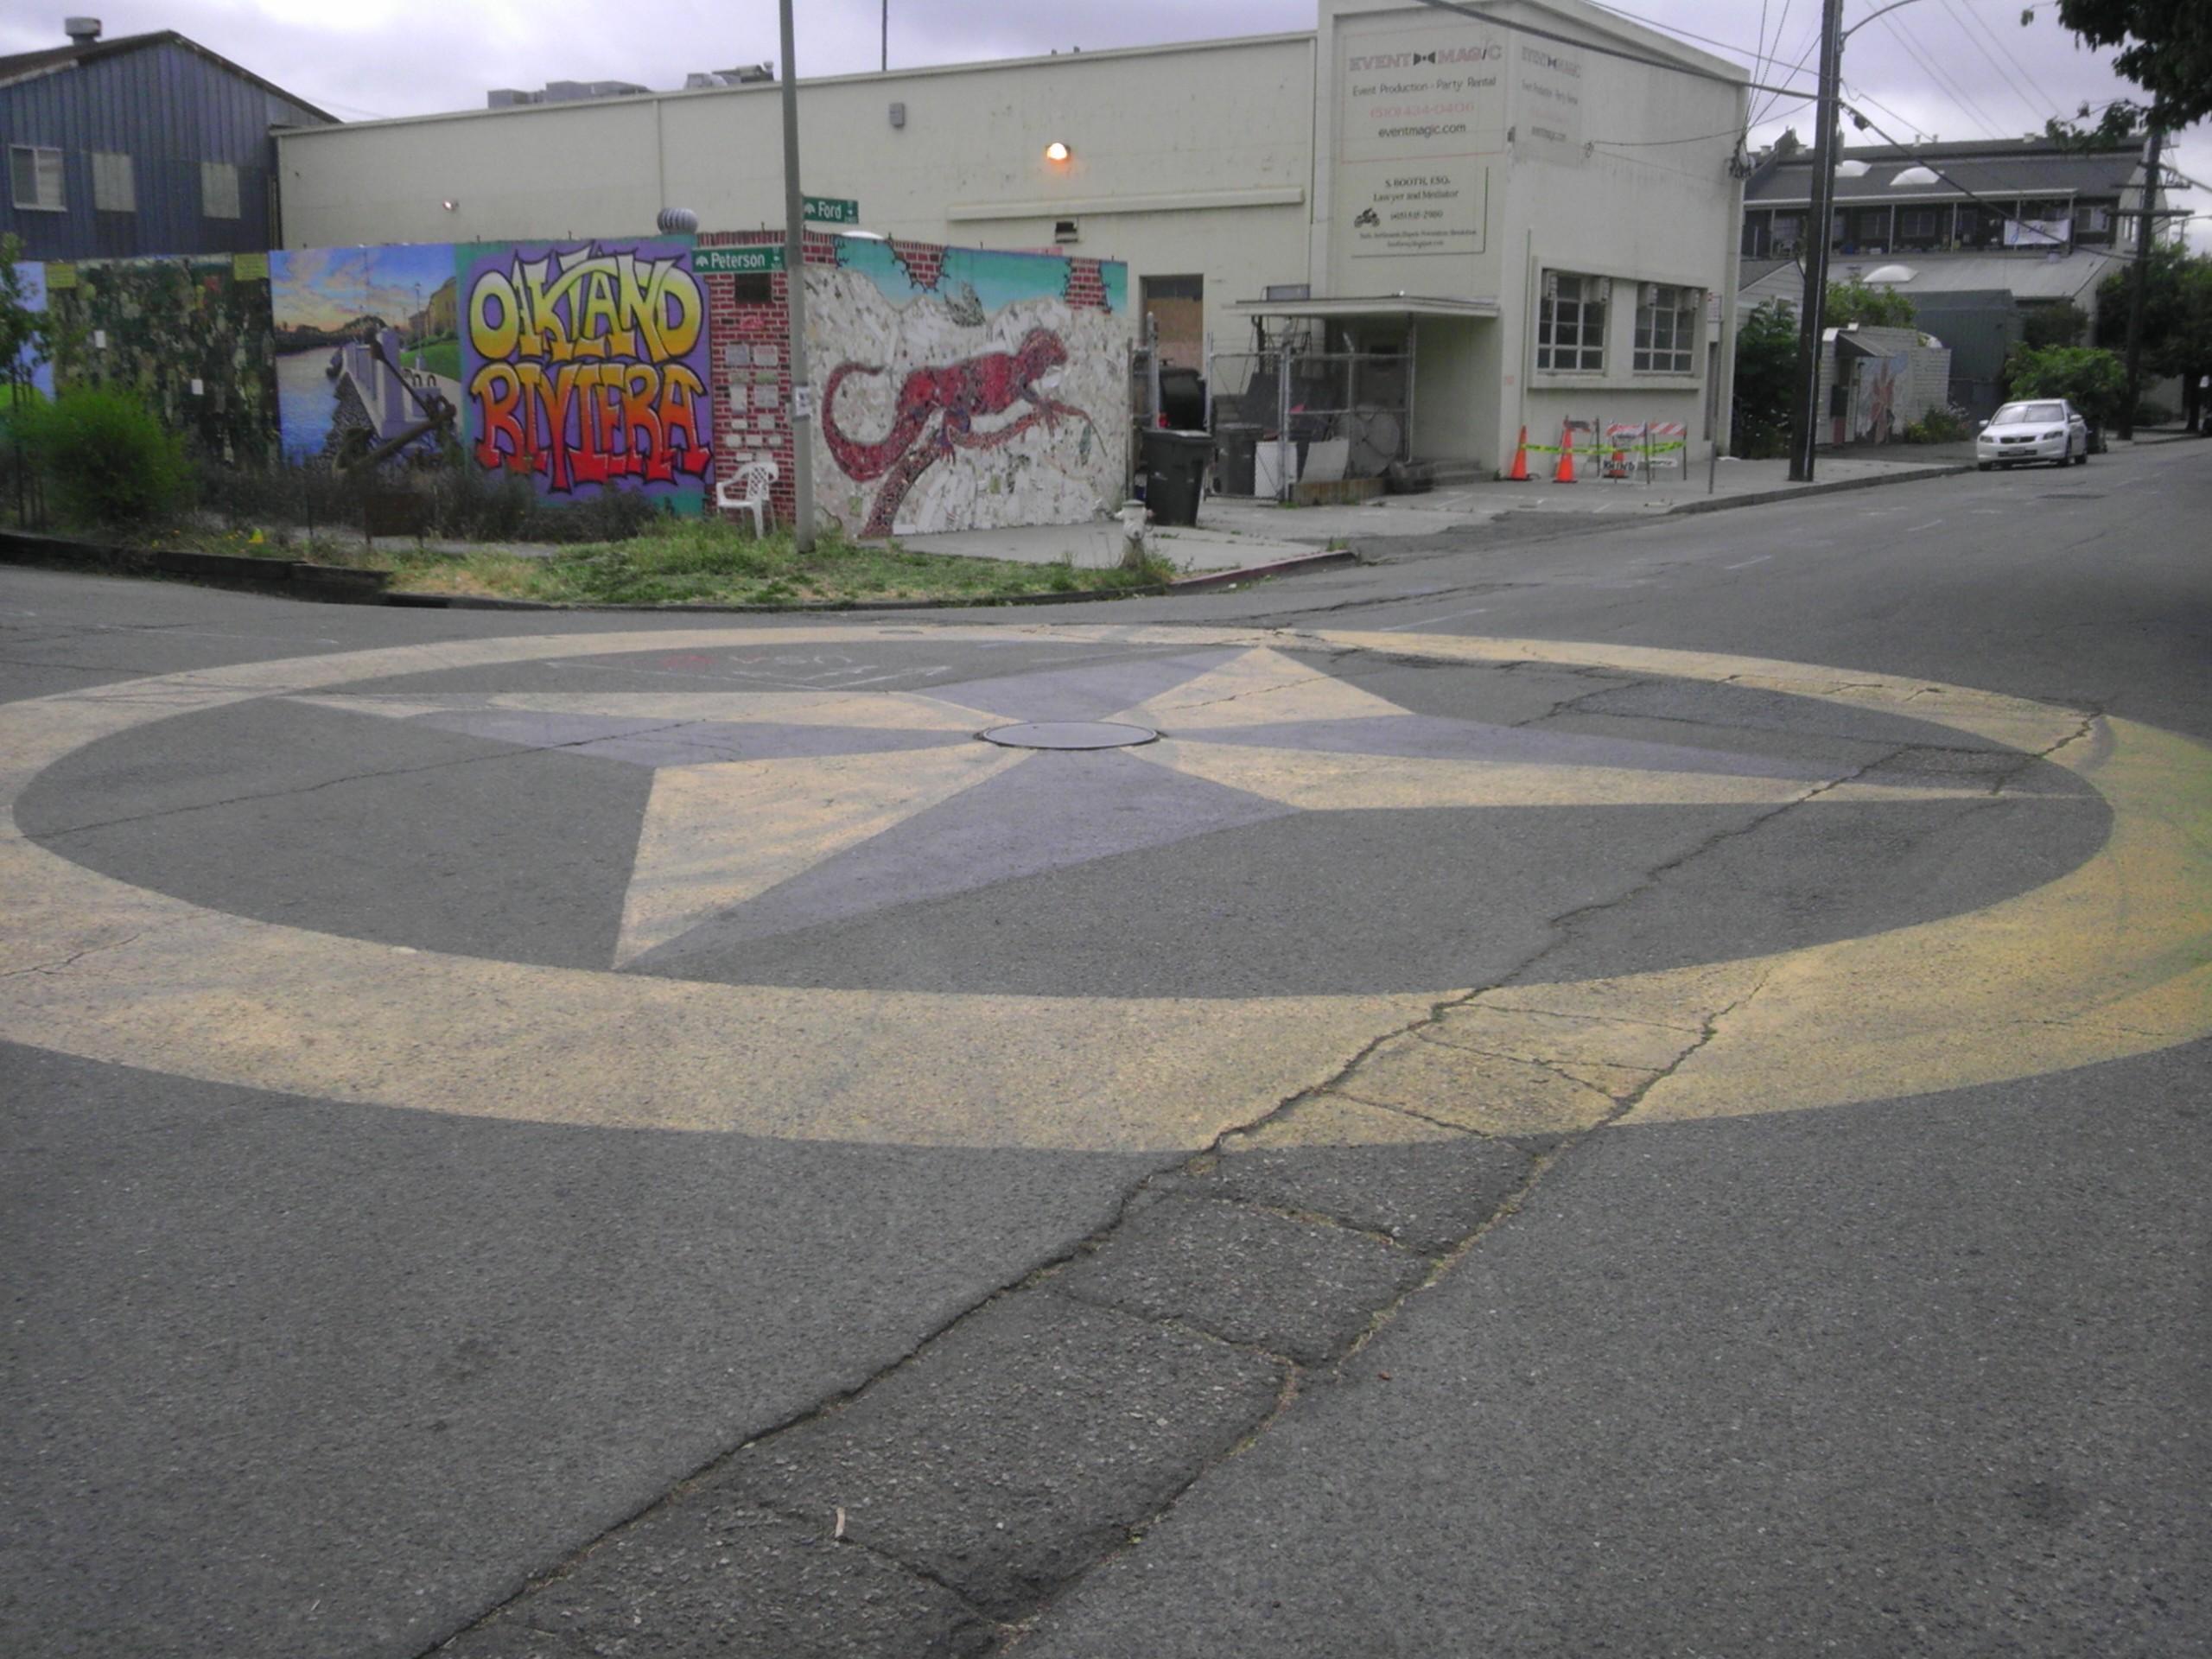 Jingletown Oakland California